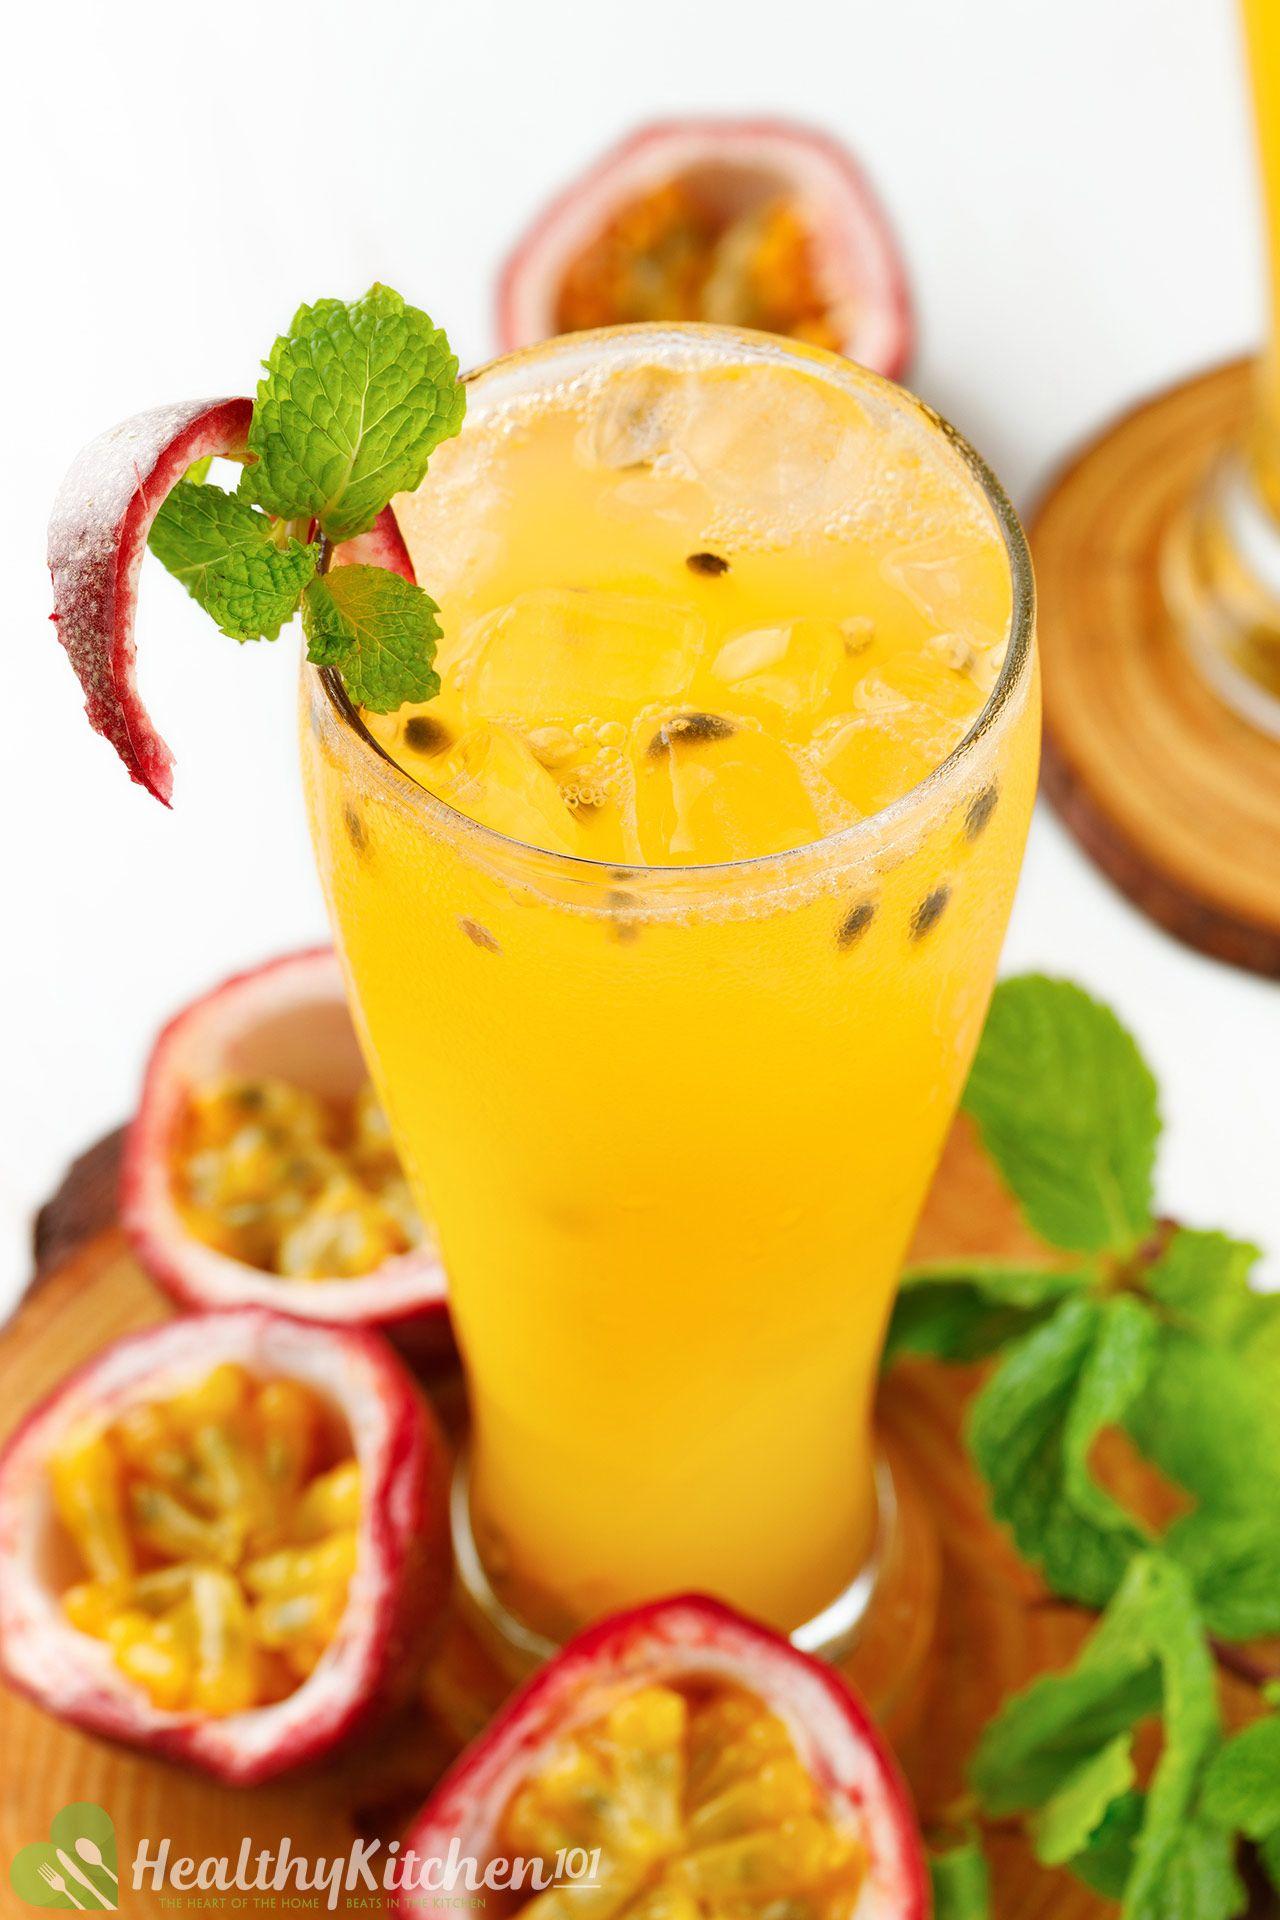 homemade passion fruit juice recipe